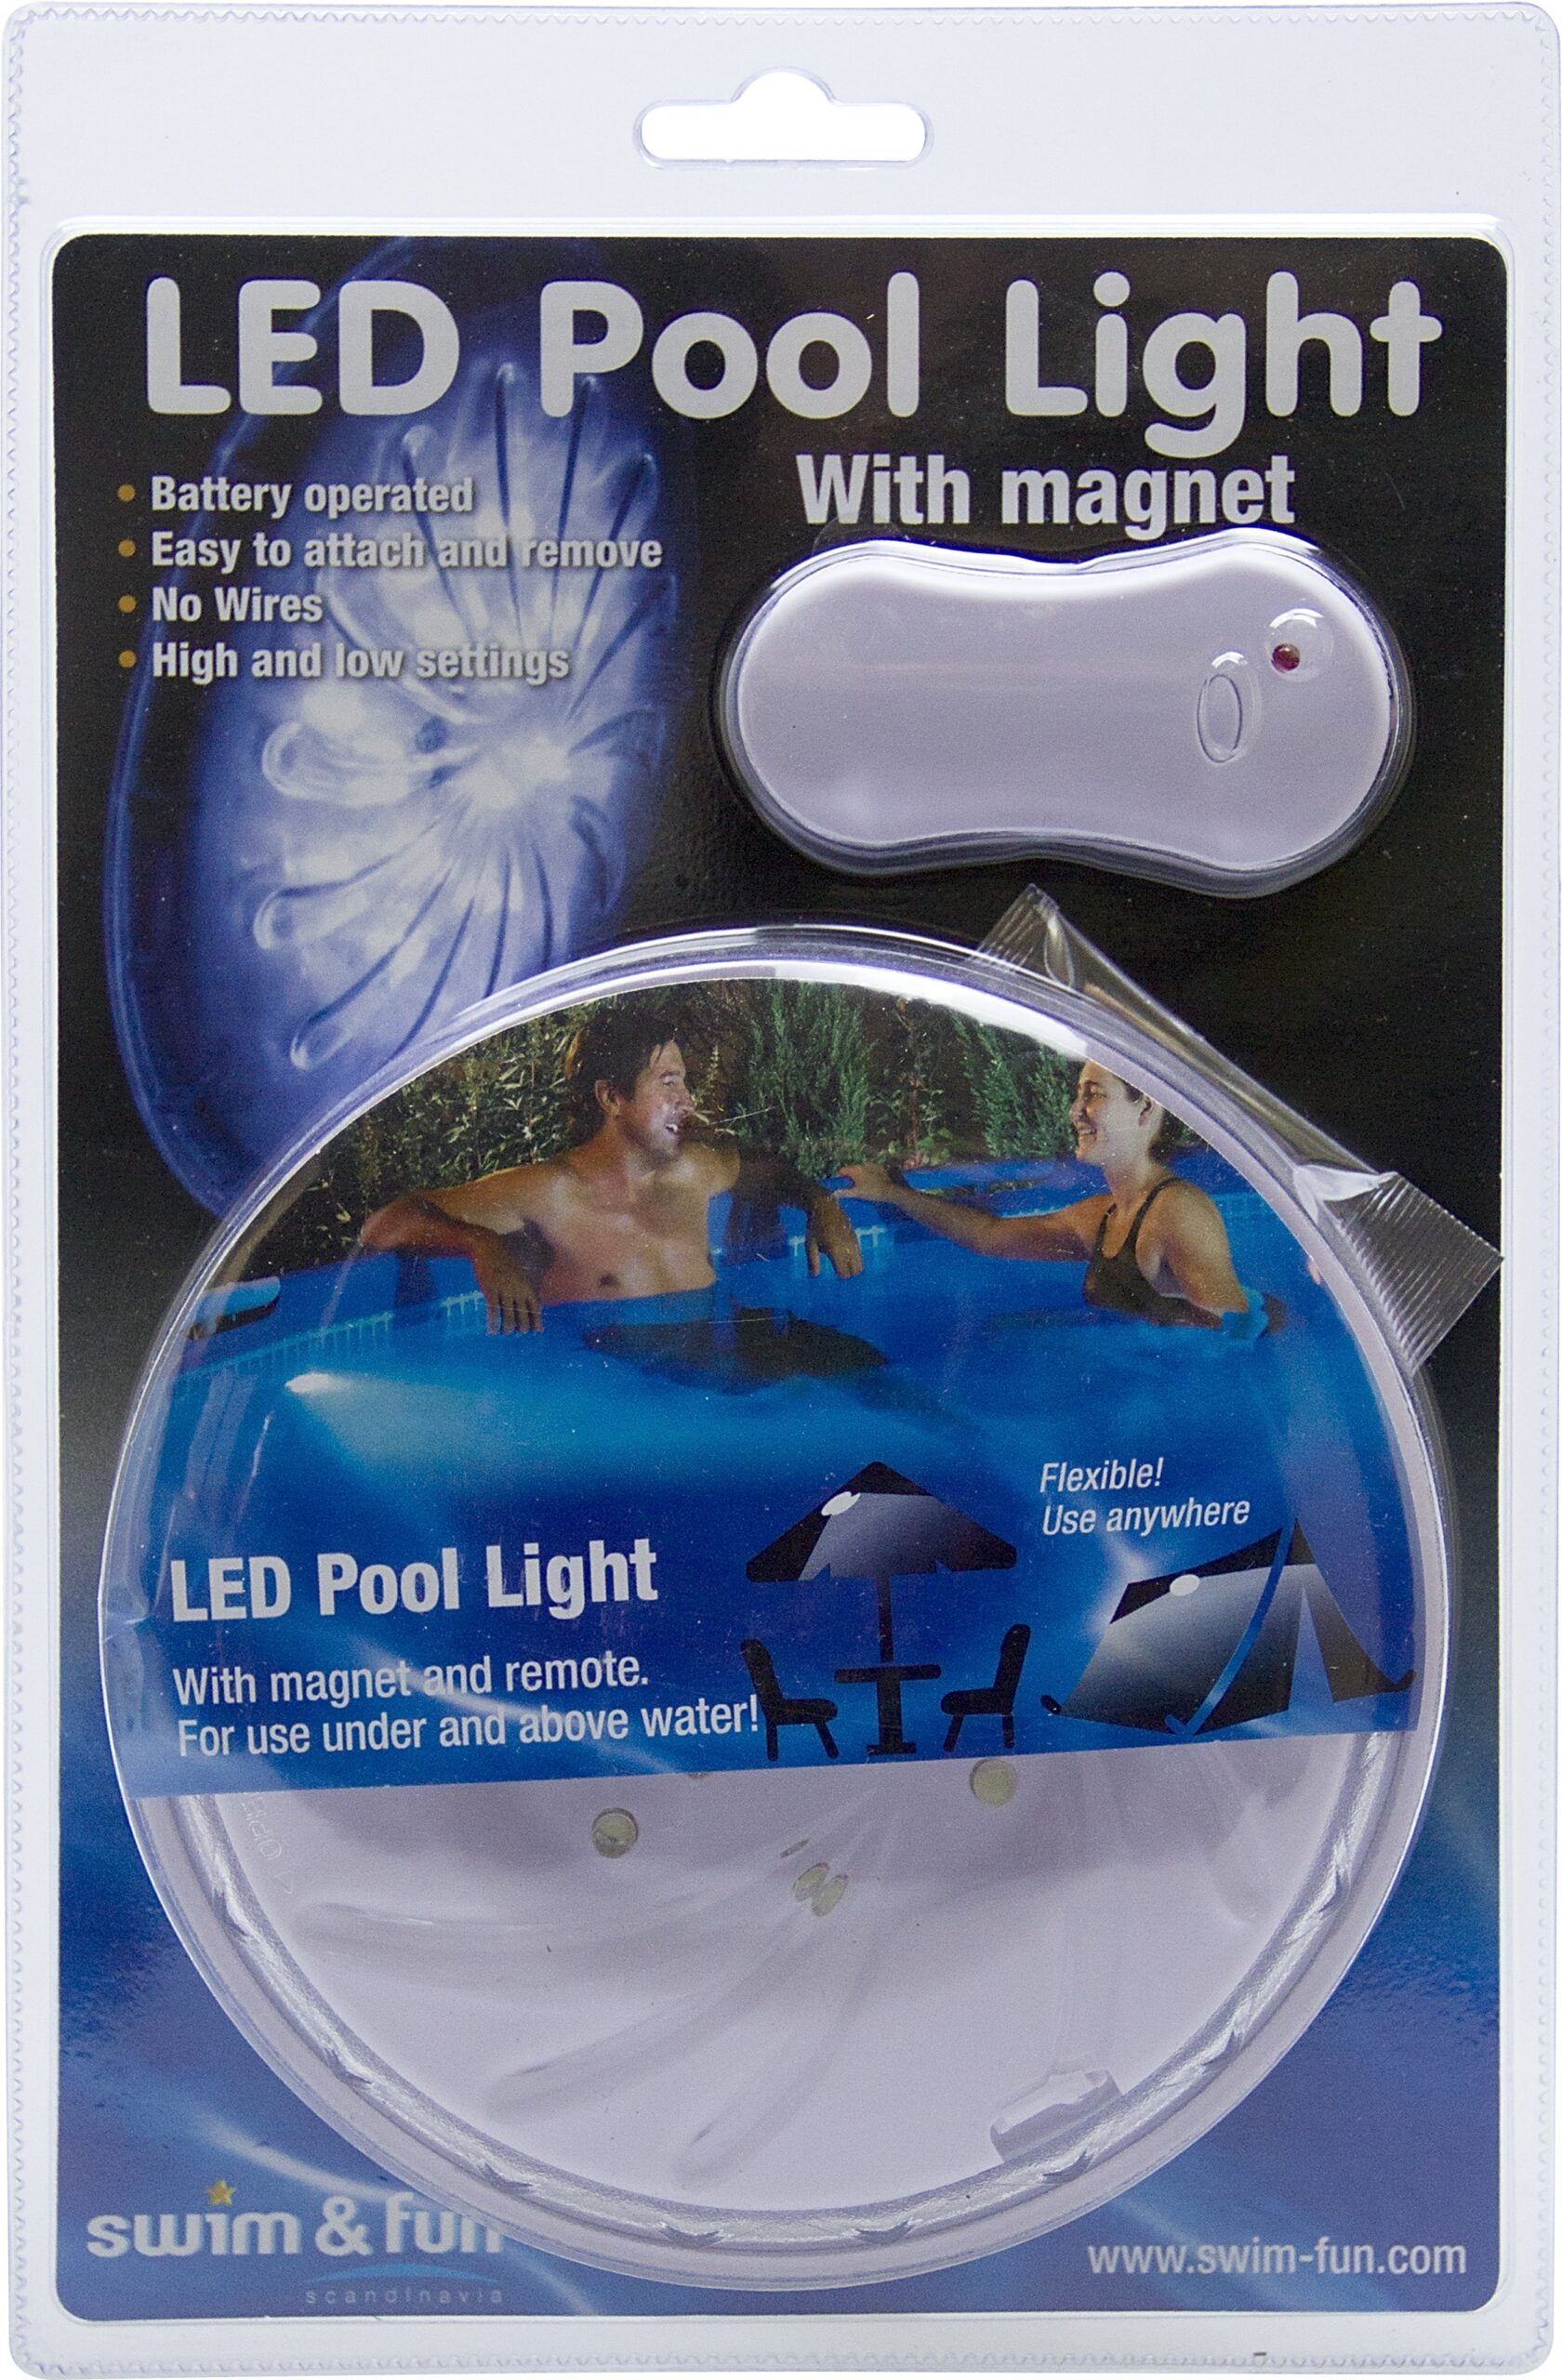 IM-1675-LED-Pool-Light-300